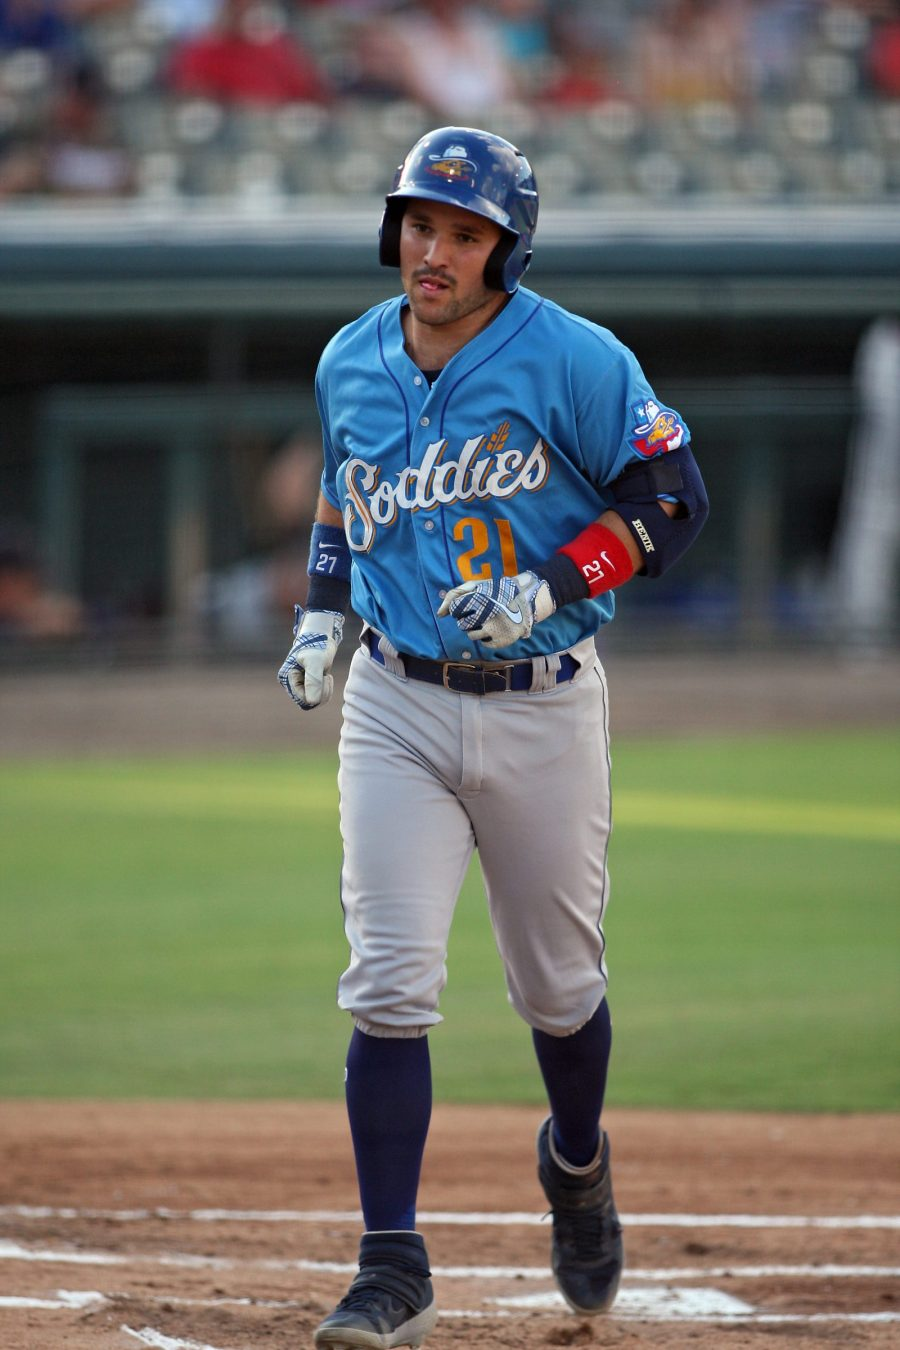 Padres prospect Luis Torrens bats for Amarillo Sod Poodles